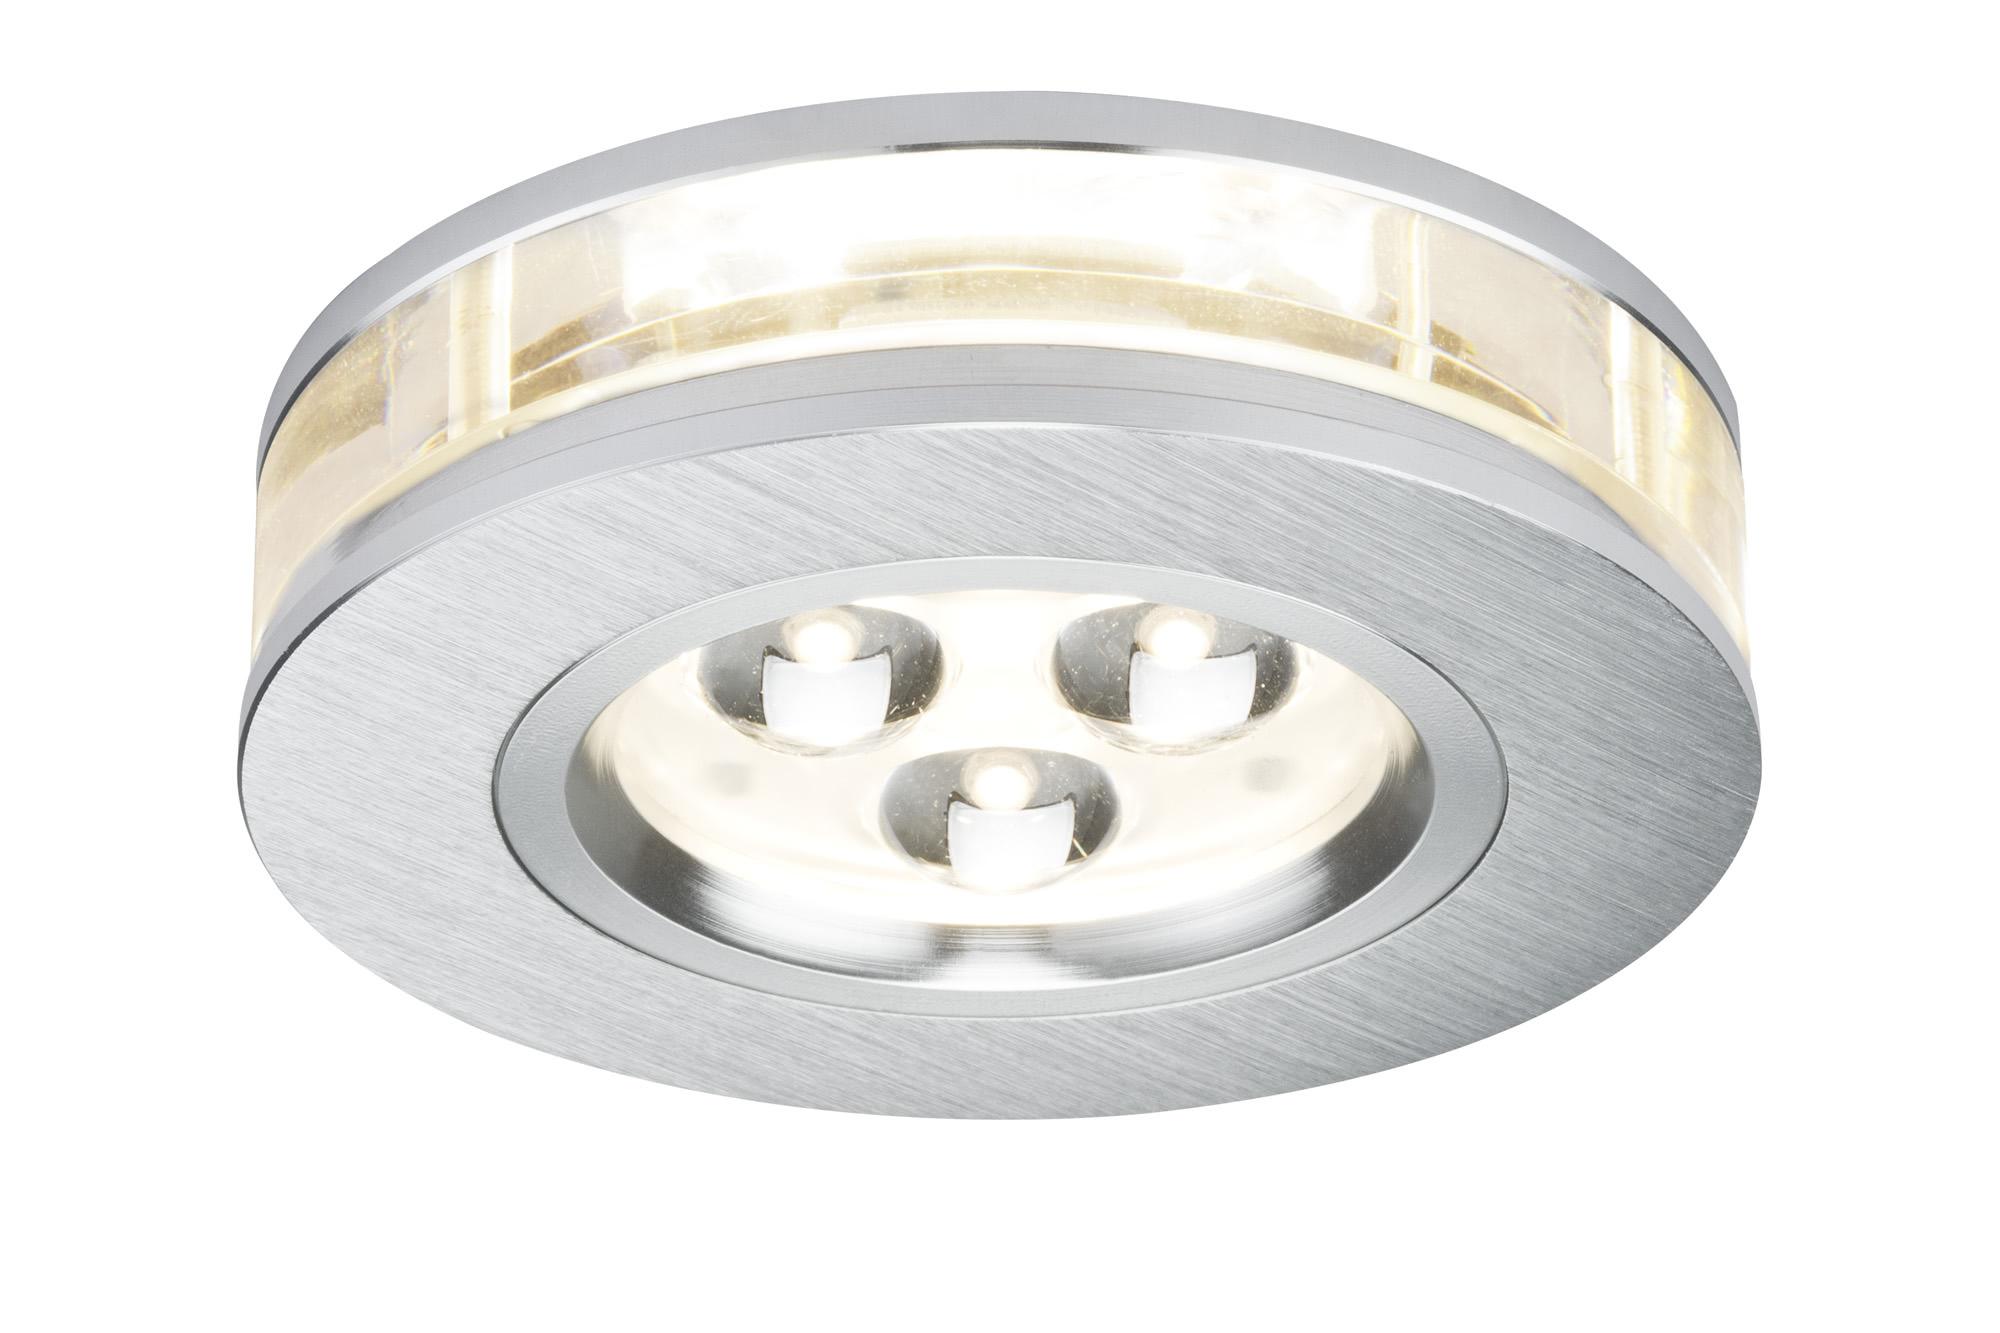 Paulmann. 92541 Набор светильников Liro rund LED 3x3W Alu-g